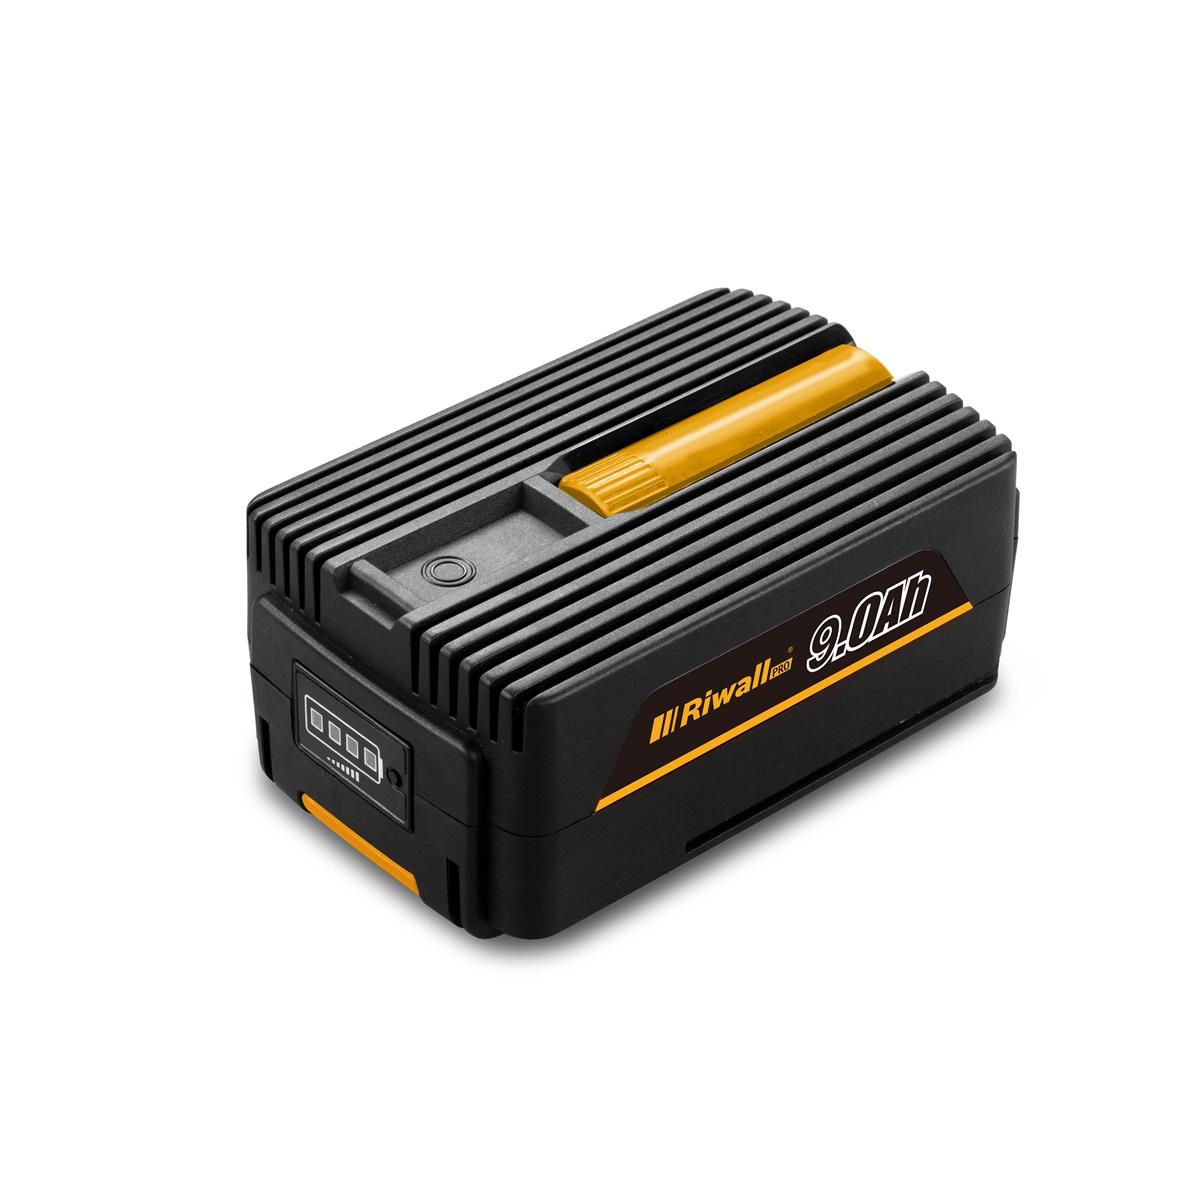 Riwall PRO RAB 940, bateria 40 V (9 Ah)